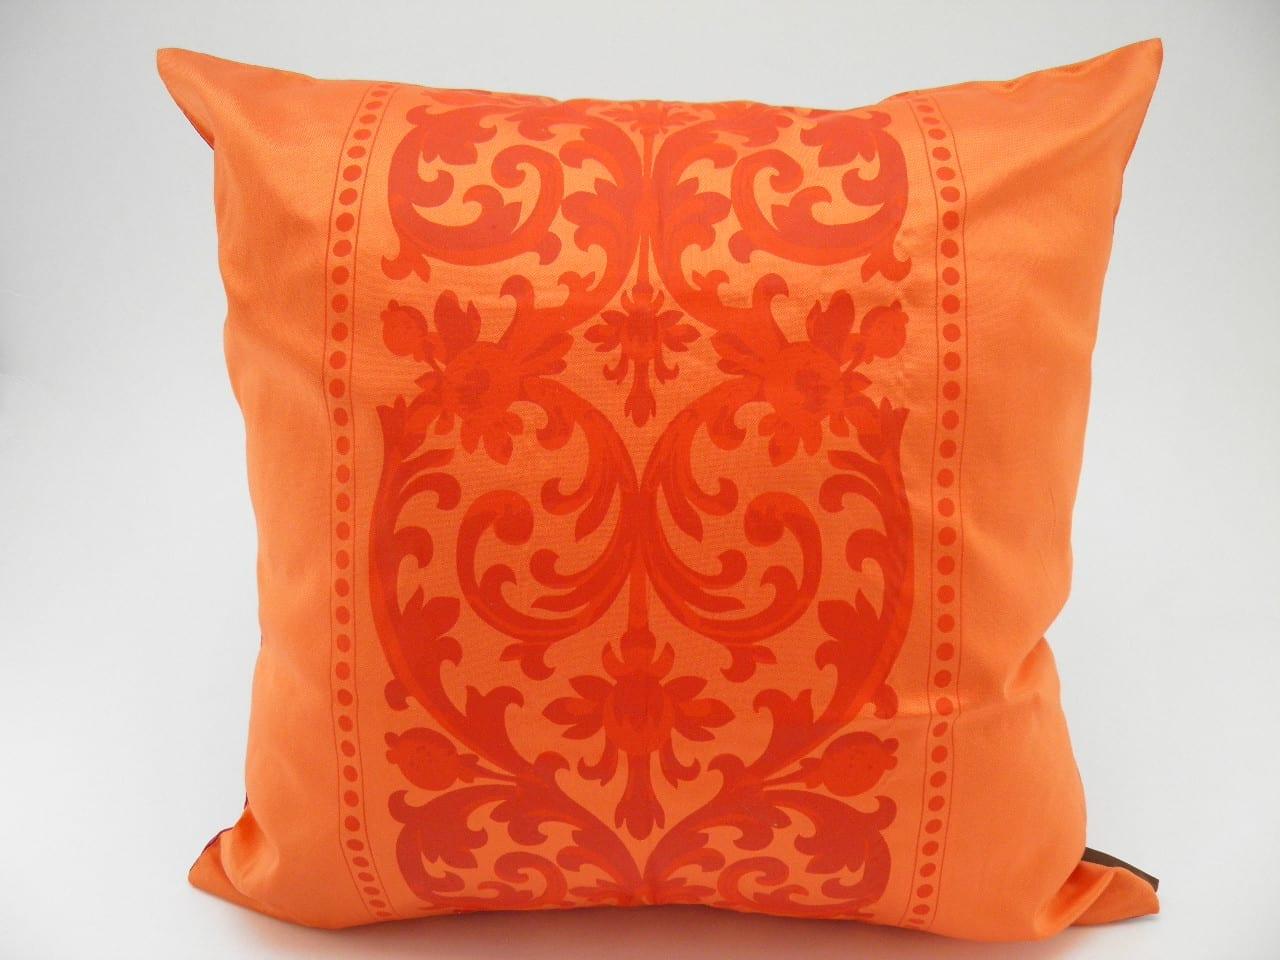 Angkor Cushion Cover – 2 in 1 - Fuchsia / Orange - 45x45cm